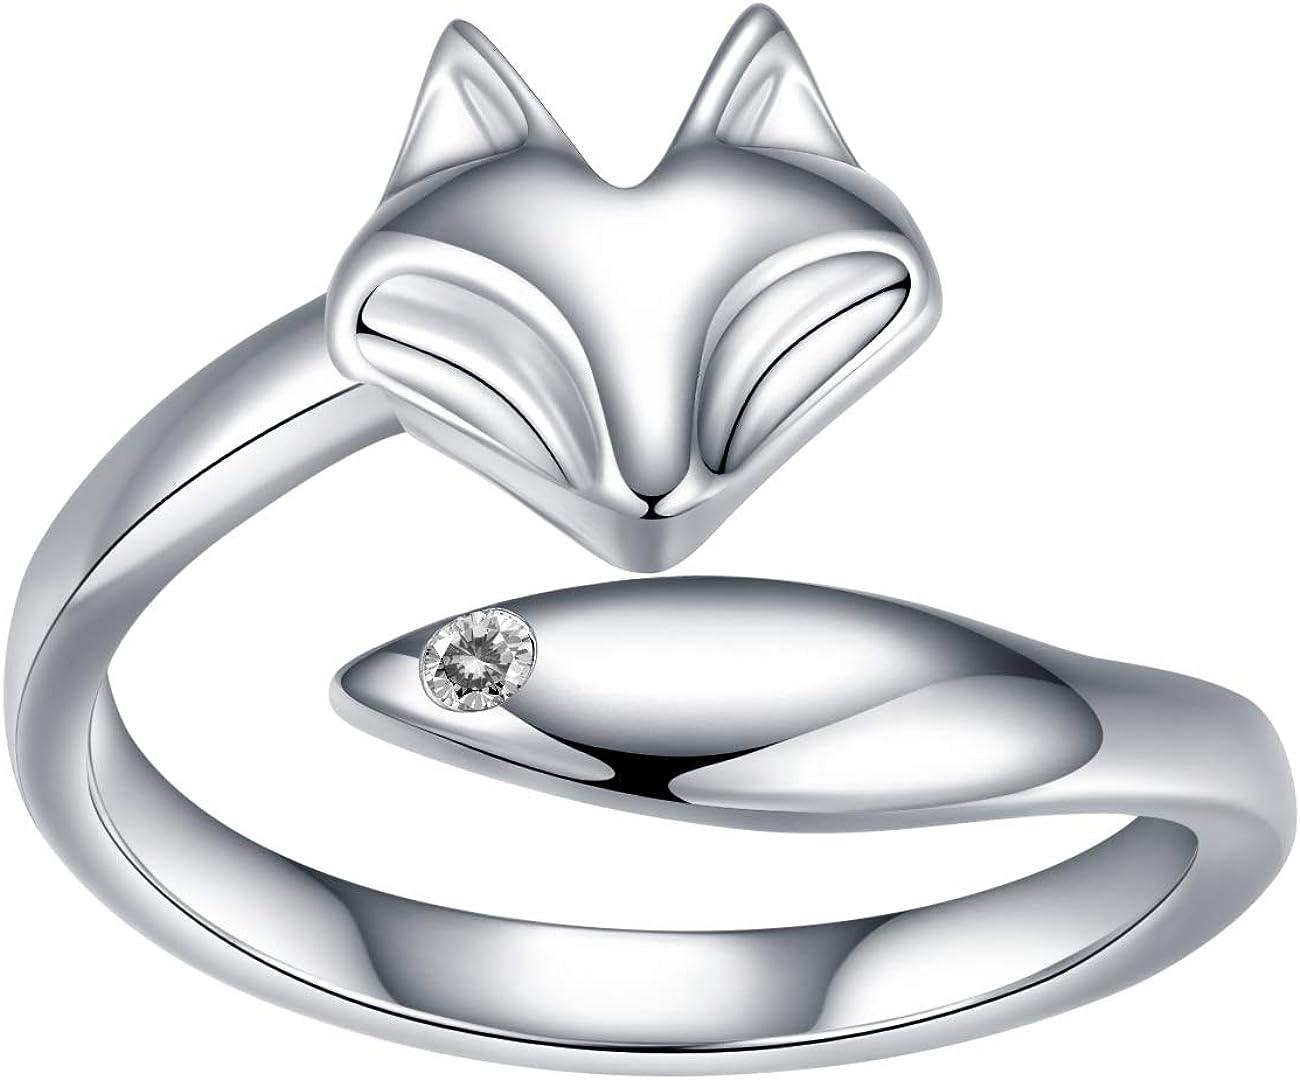 QANYUE Washington Mall Women's S925 Sterling Silver CZ Green Earrings Fox Ranking TOP20 White